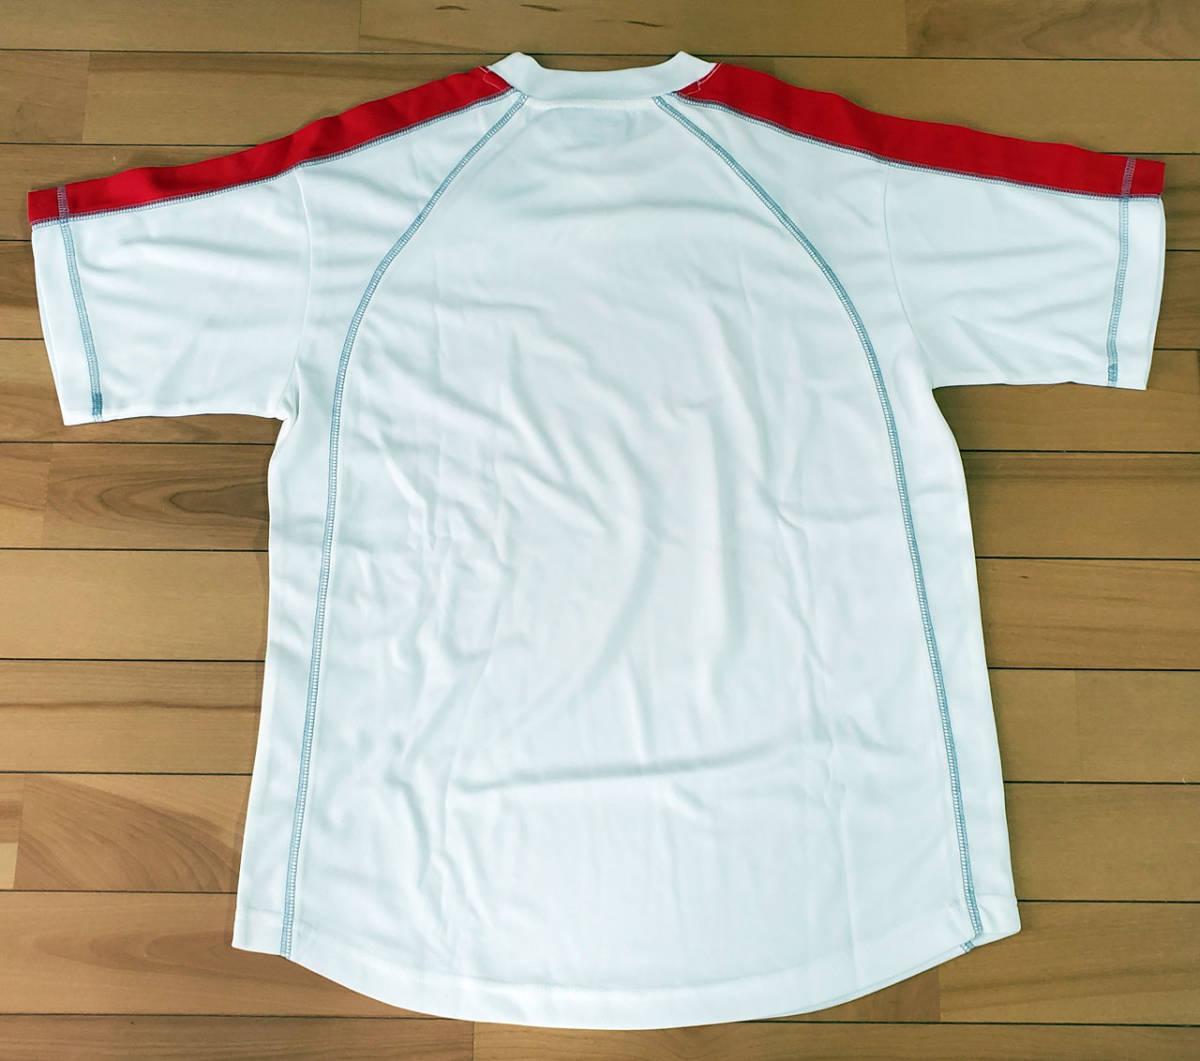 HondaRacing F1 Tシャツ Sサイズ White 未使用_画像2